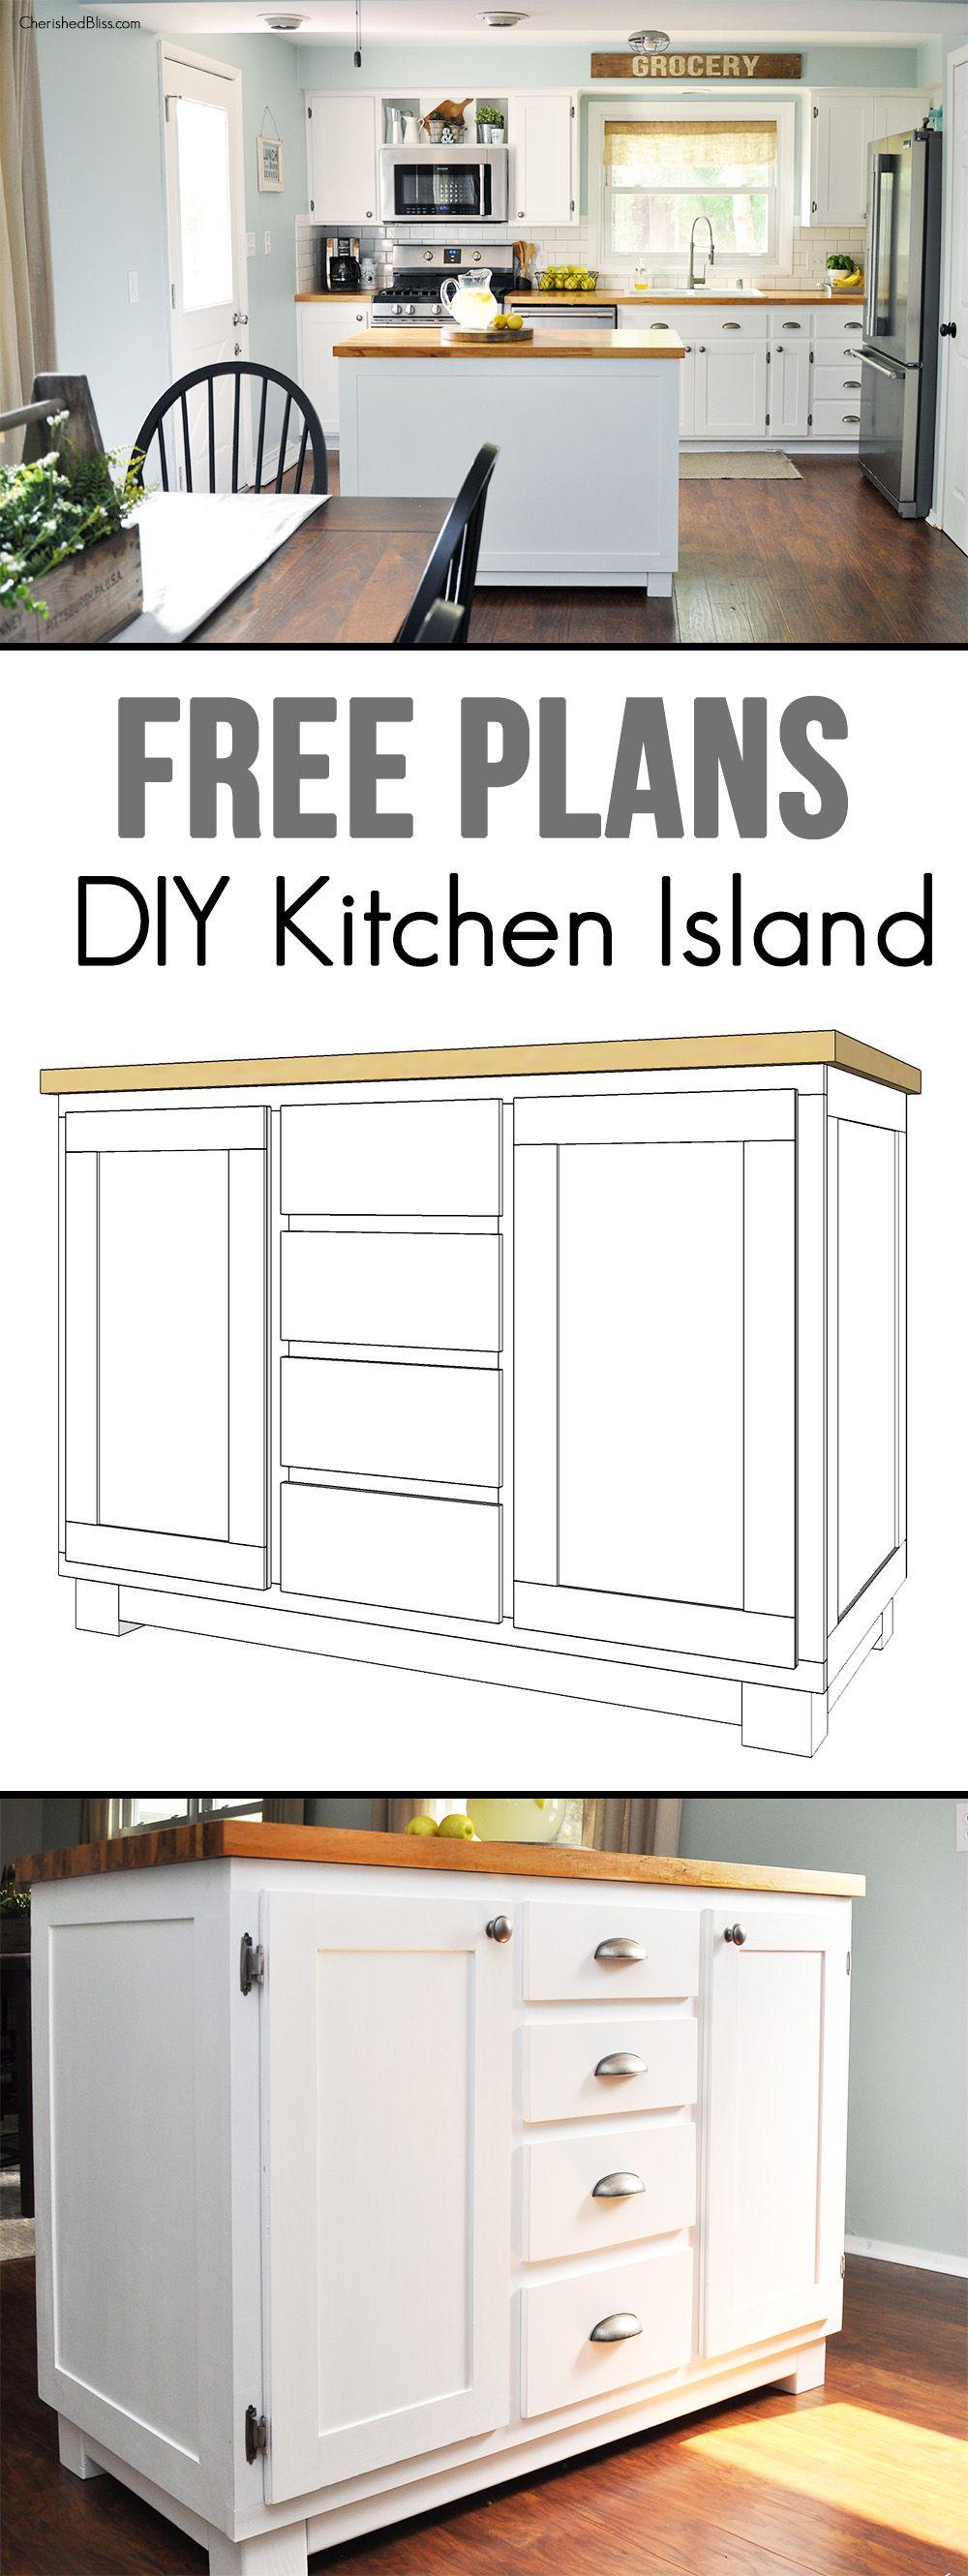 How To Build A Diy Kitchen Island Cherished Bliss Kitchen Island Plans Diy Kitchen Decor Diy Kitchen Island